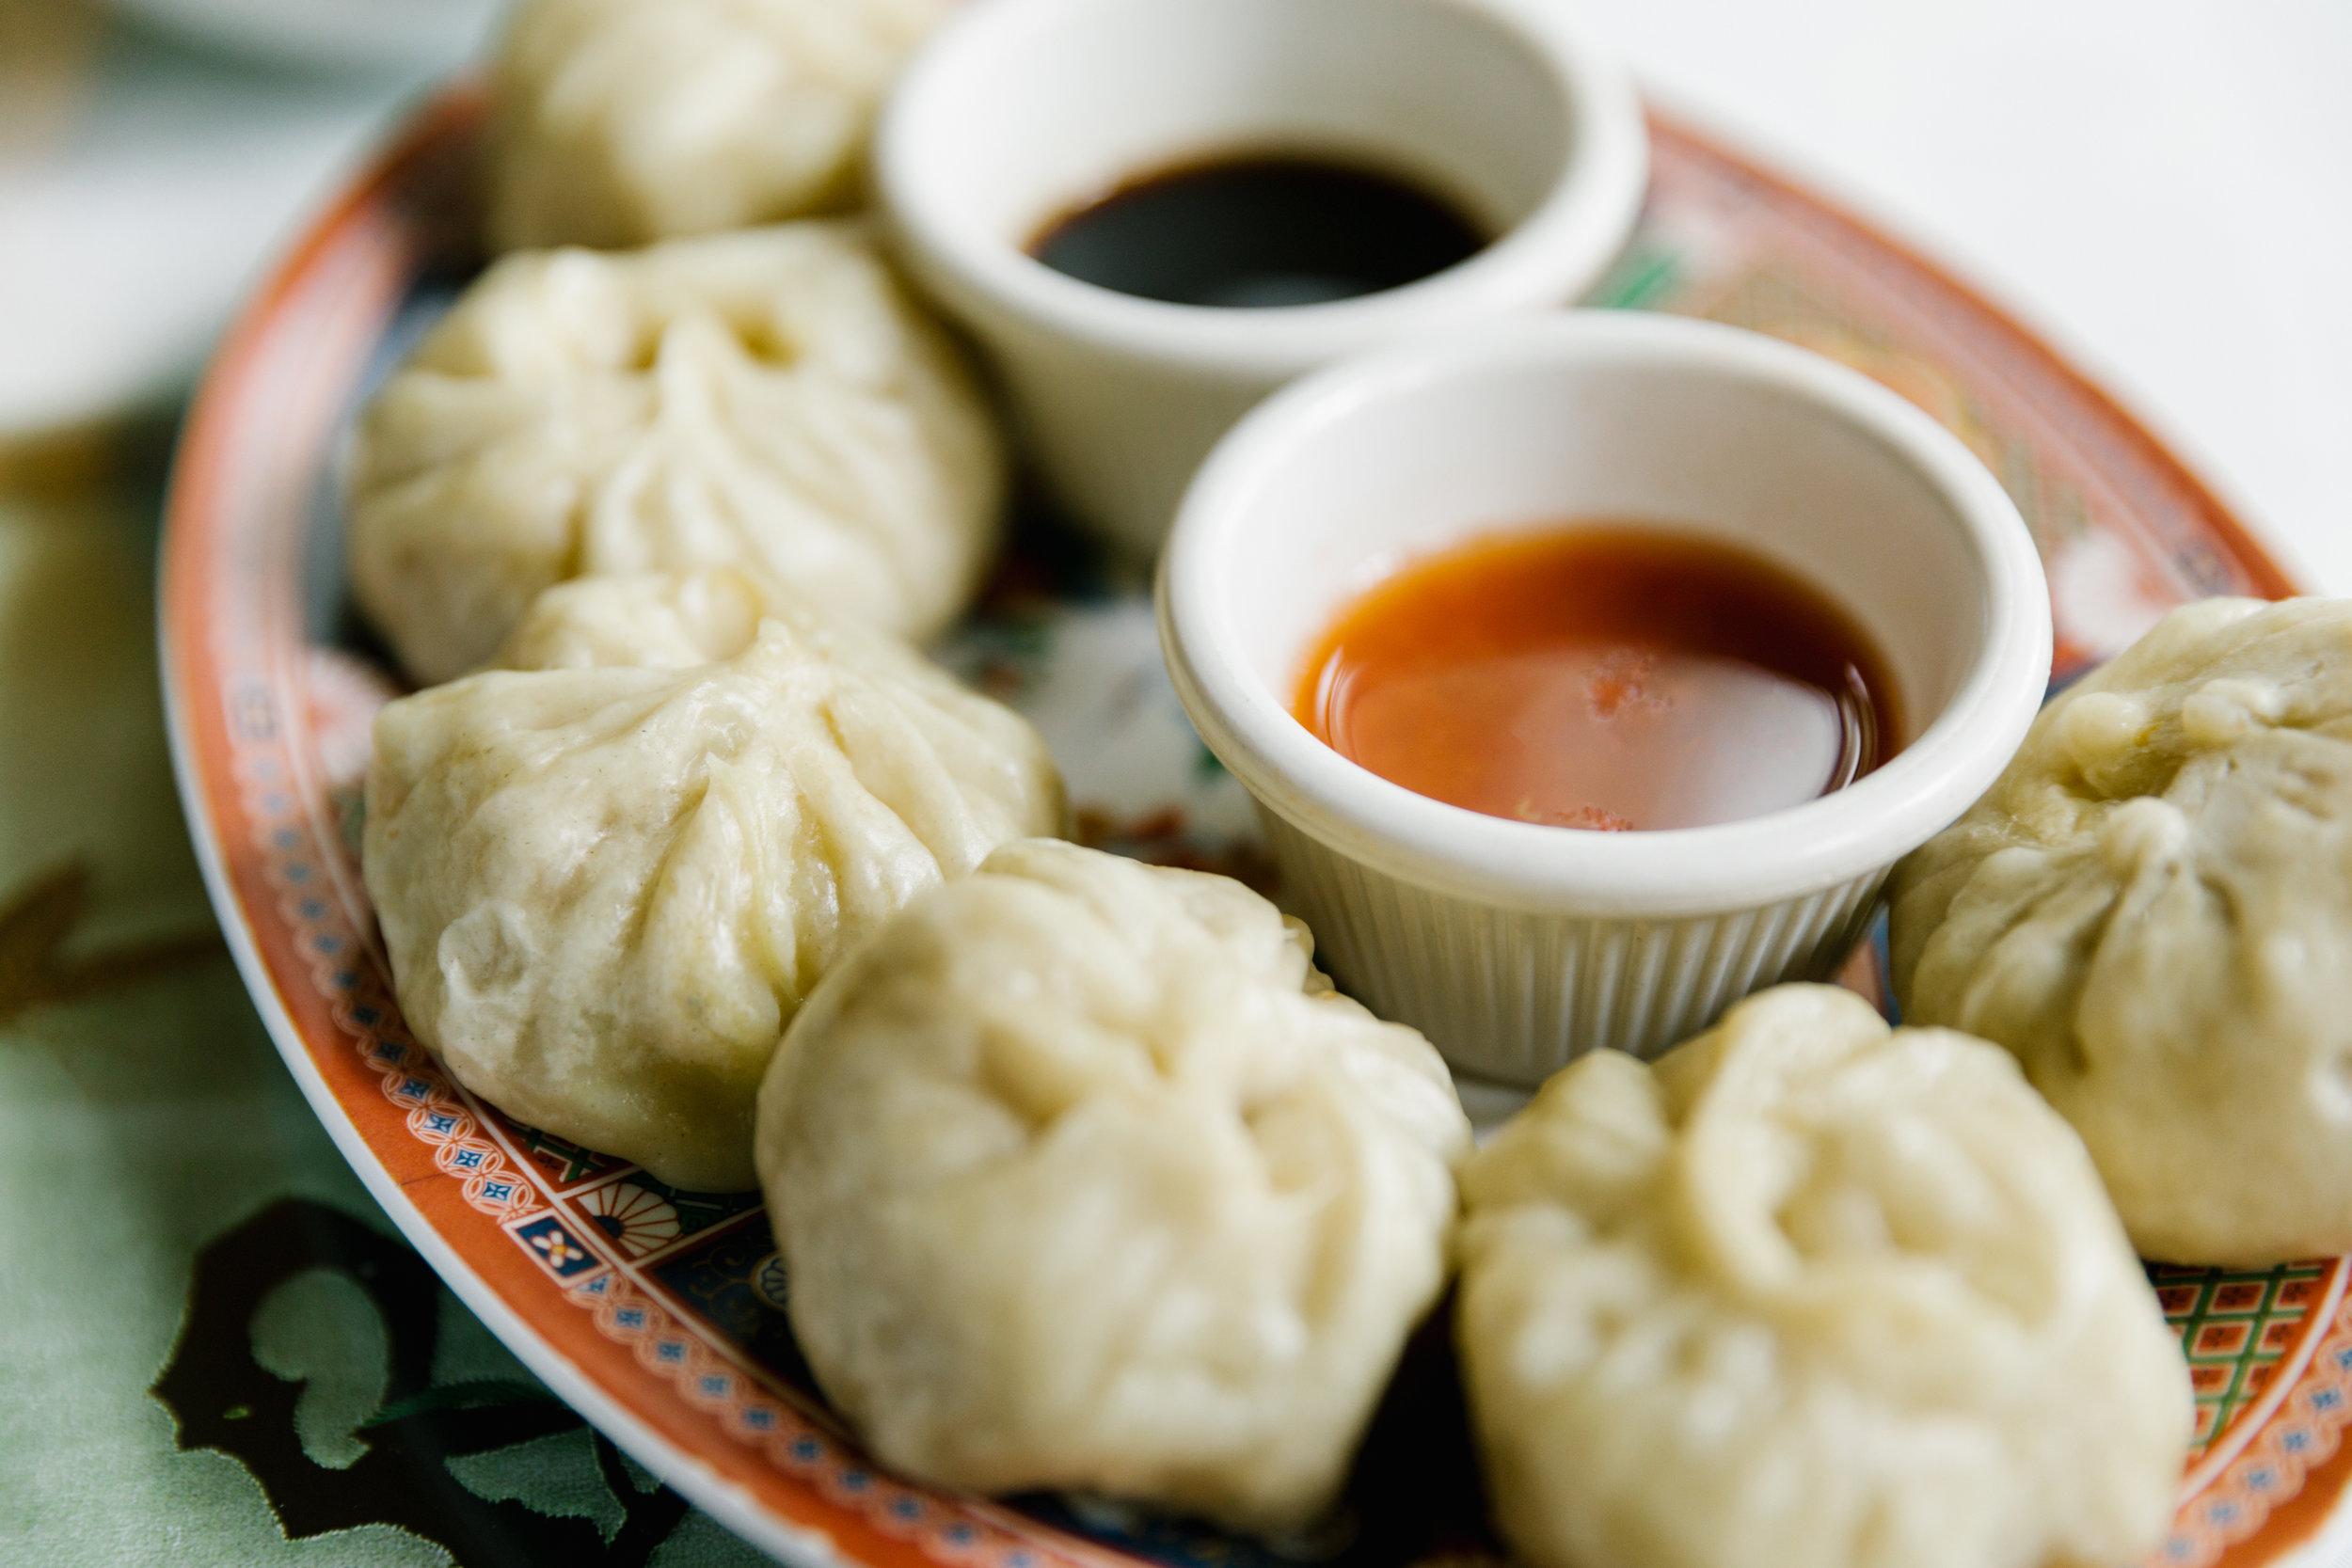 Dumpling midwest editorial food photographer